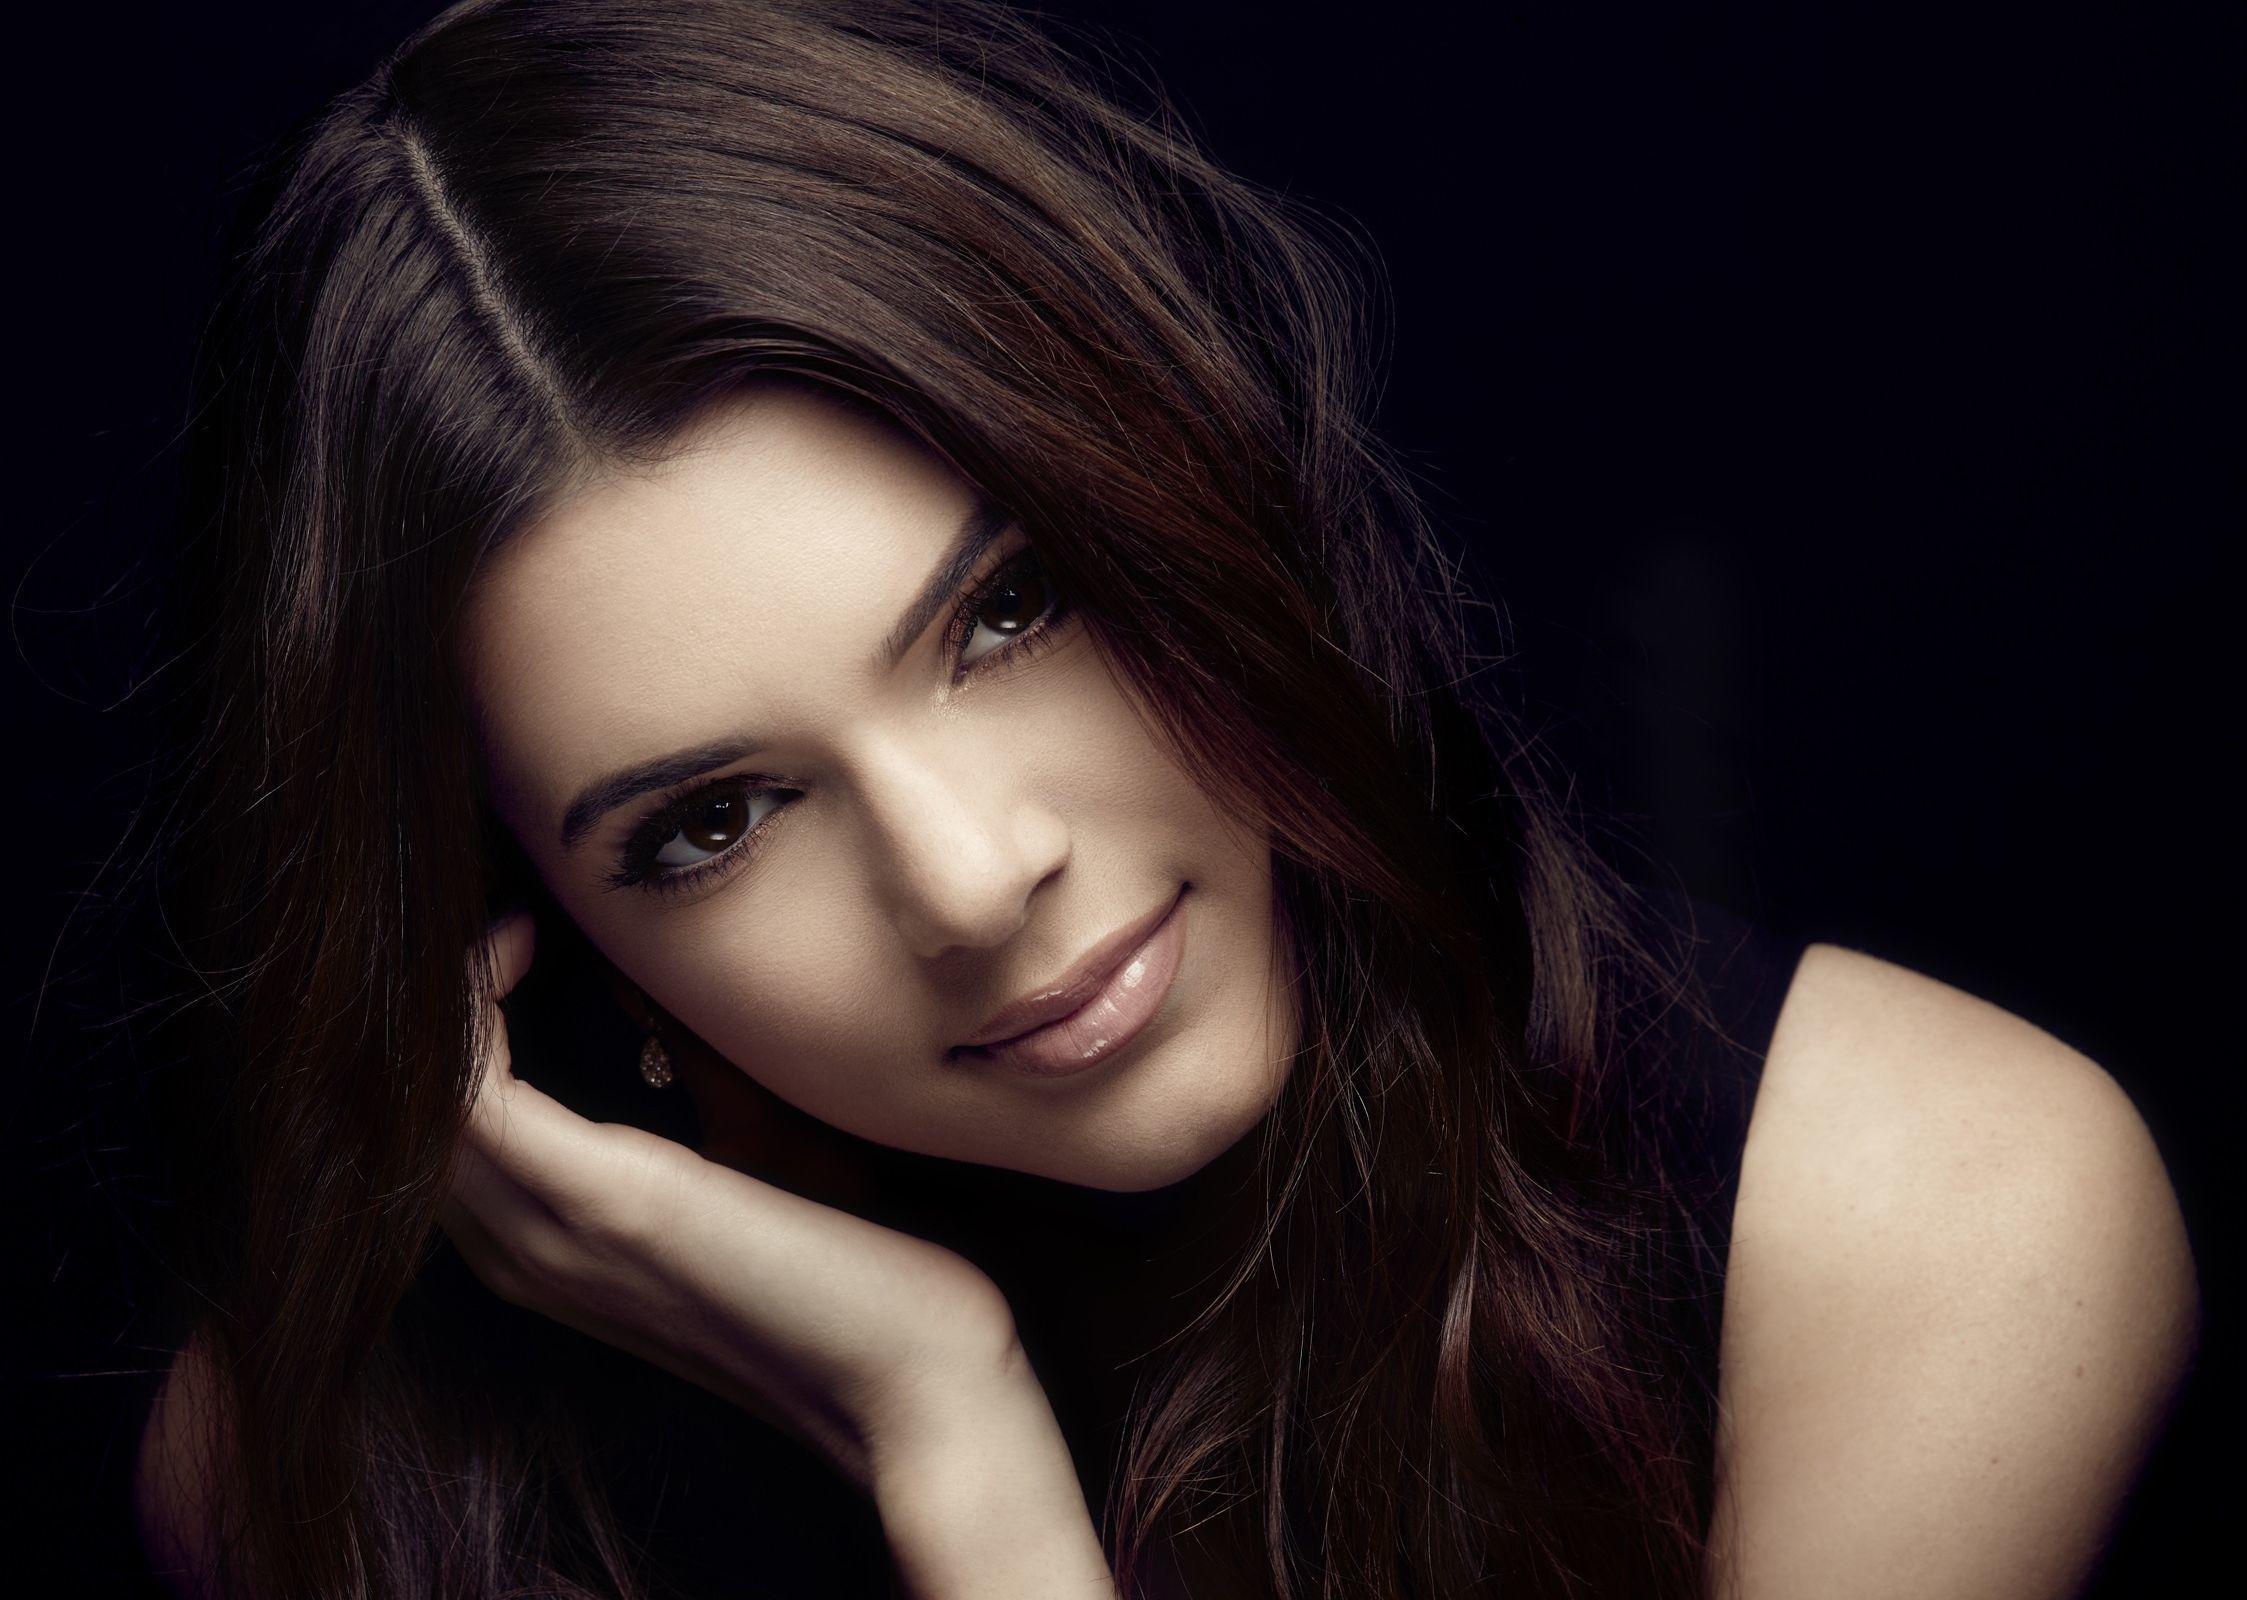 Картинка девушки самой красивой брюнетки